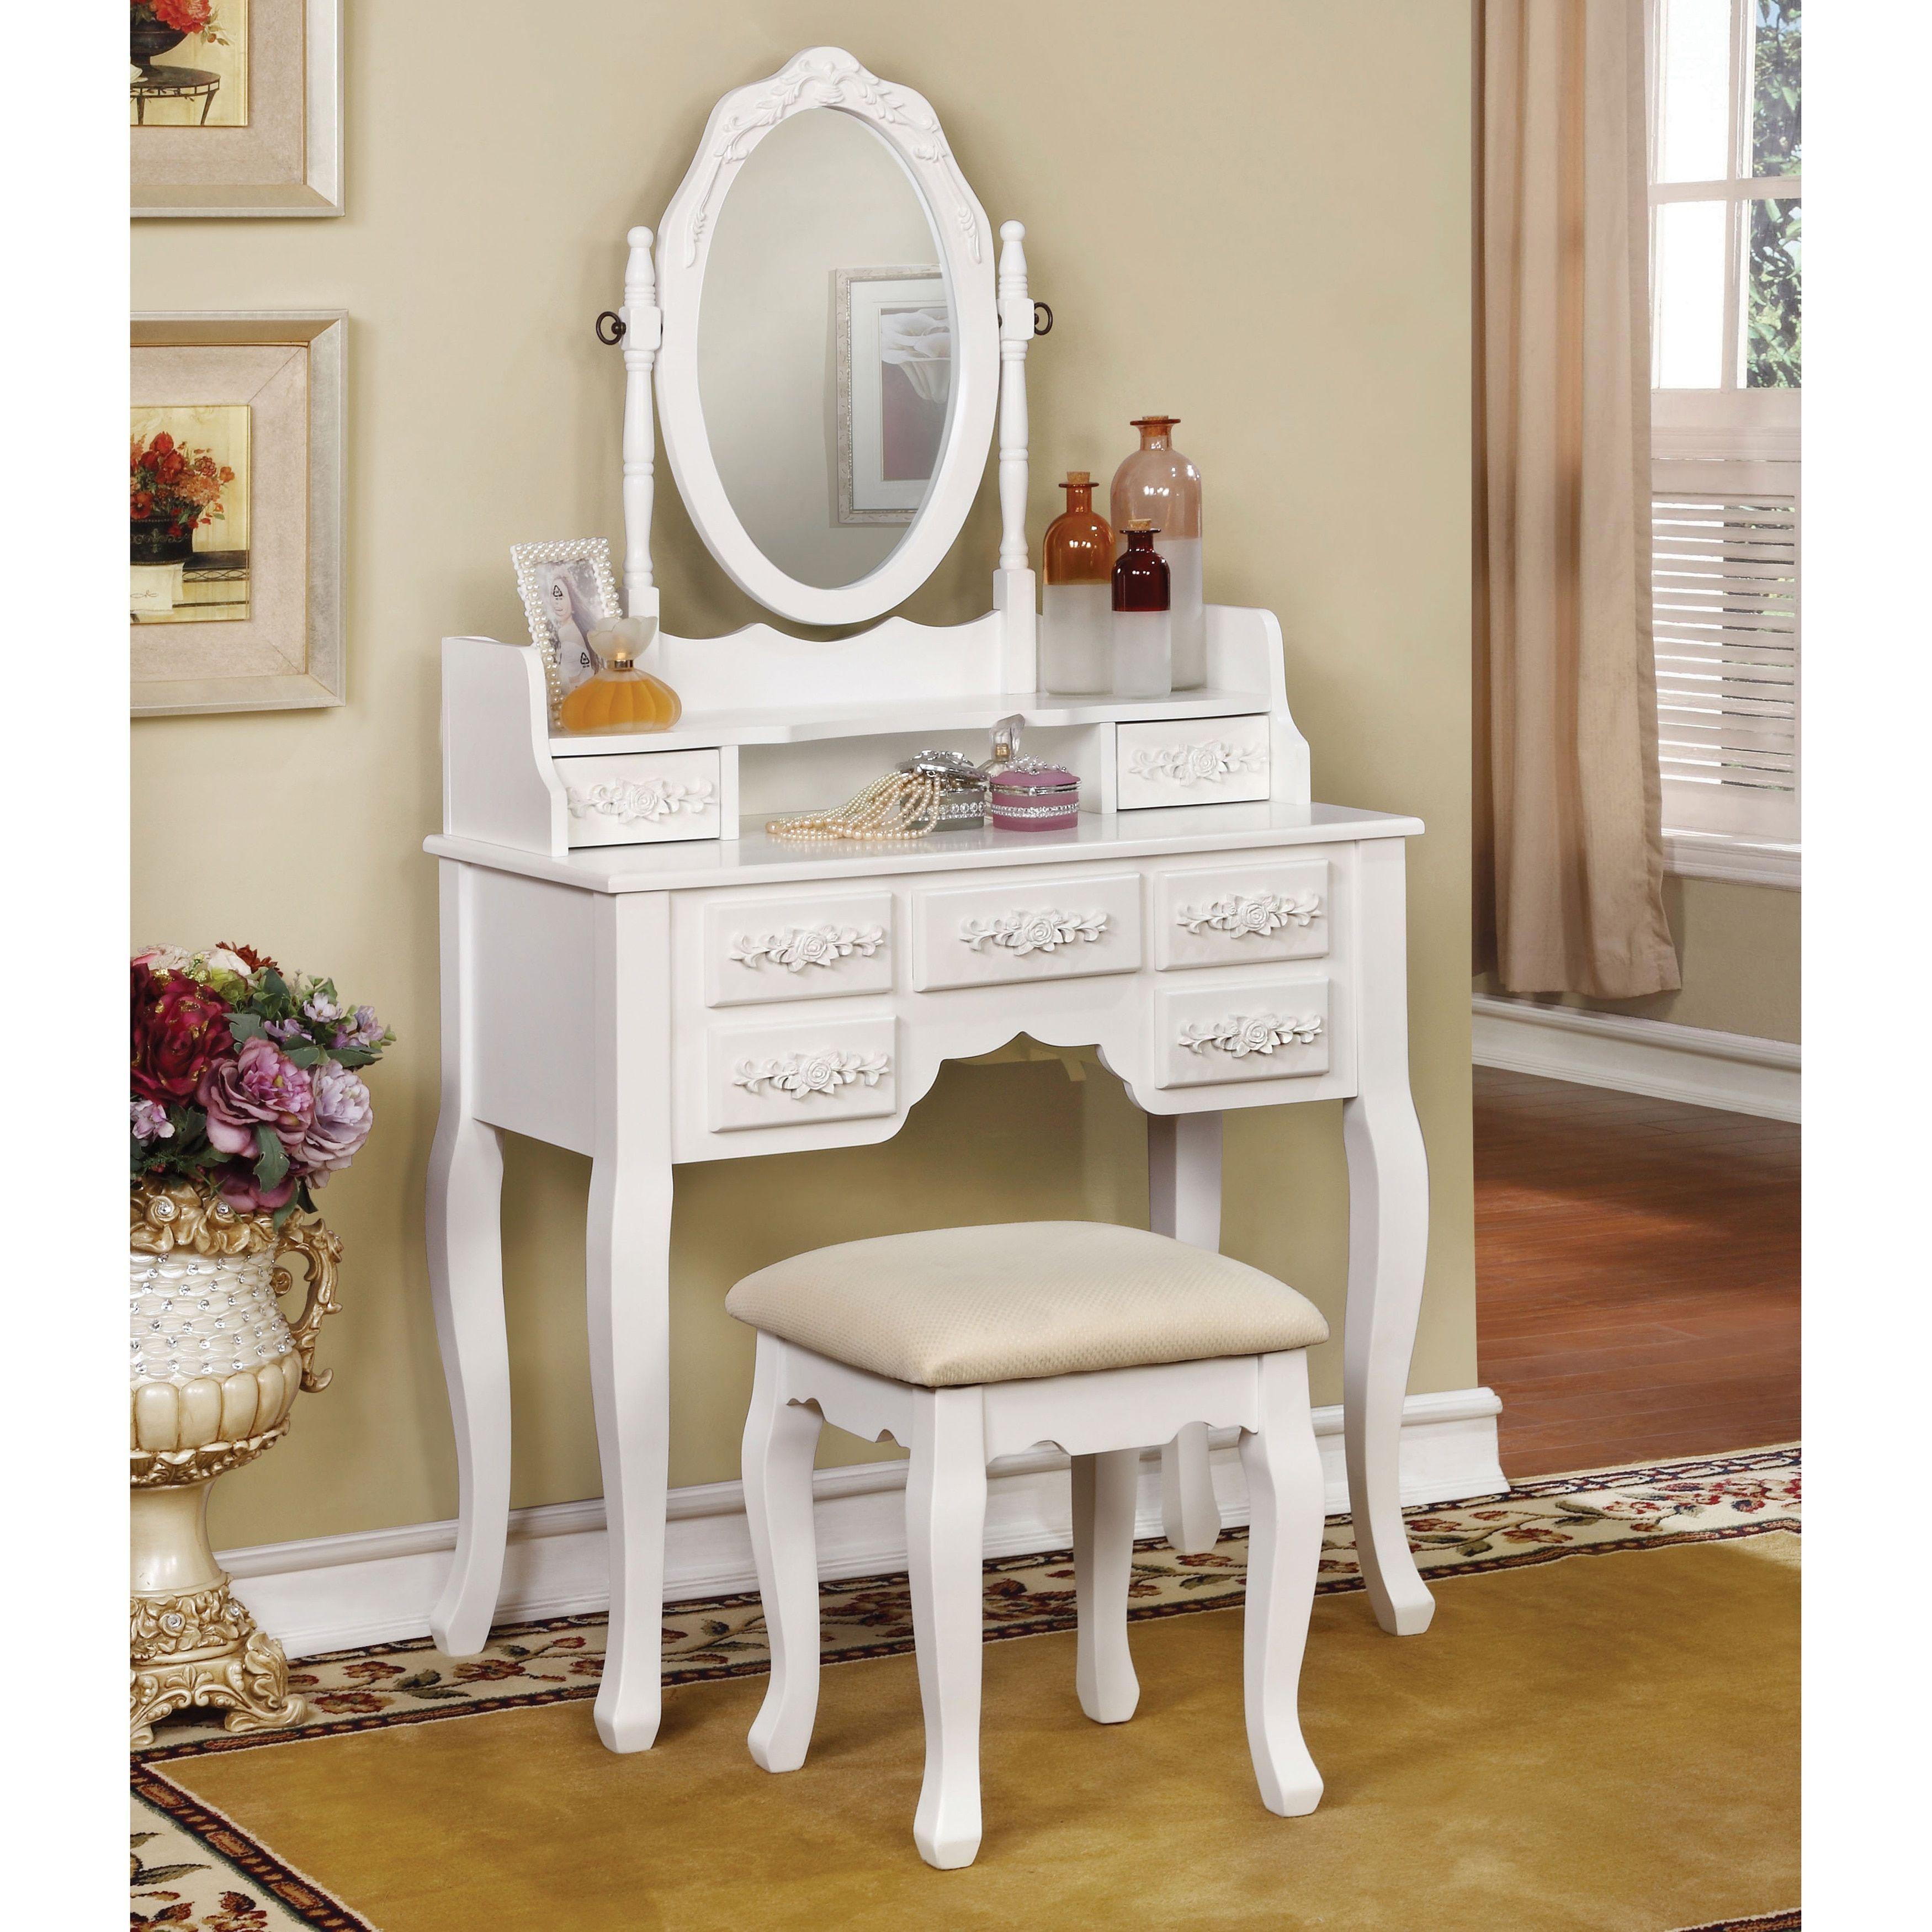 Furniture of america mayla elegant traditional piece vanity table